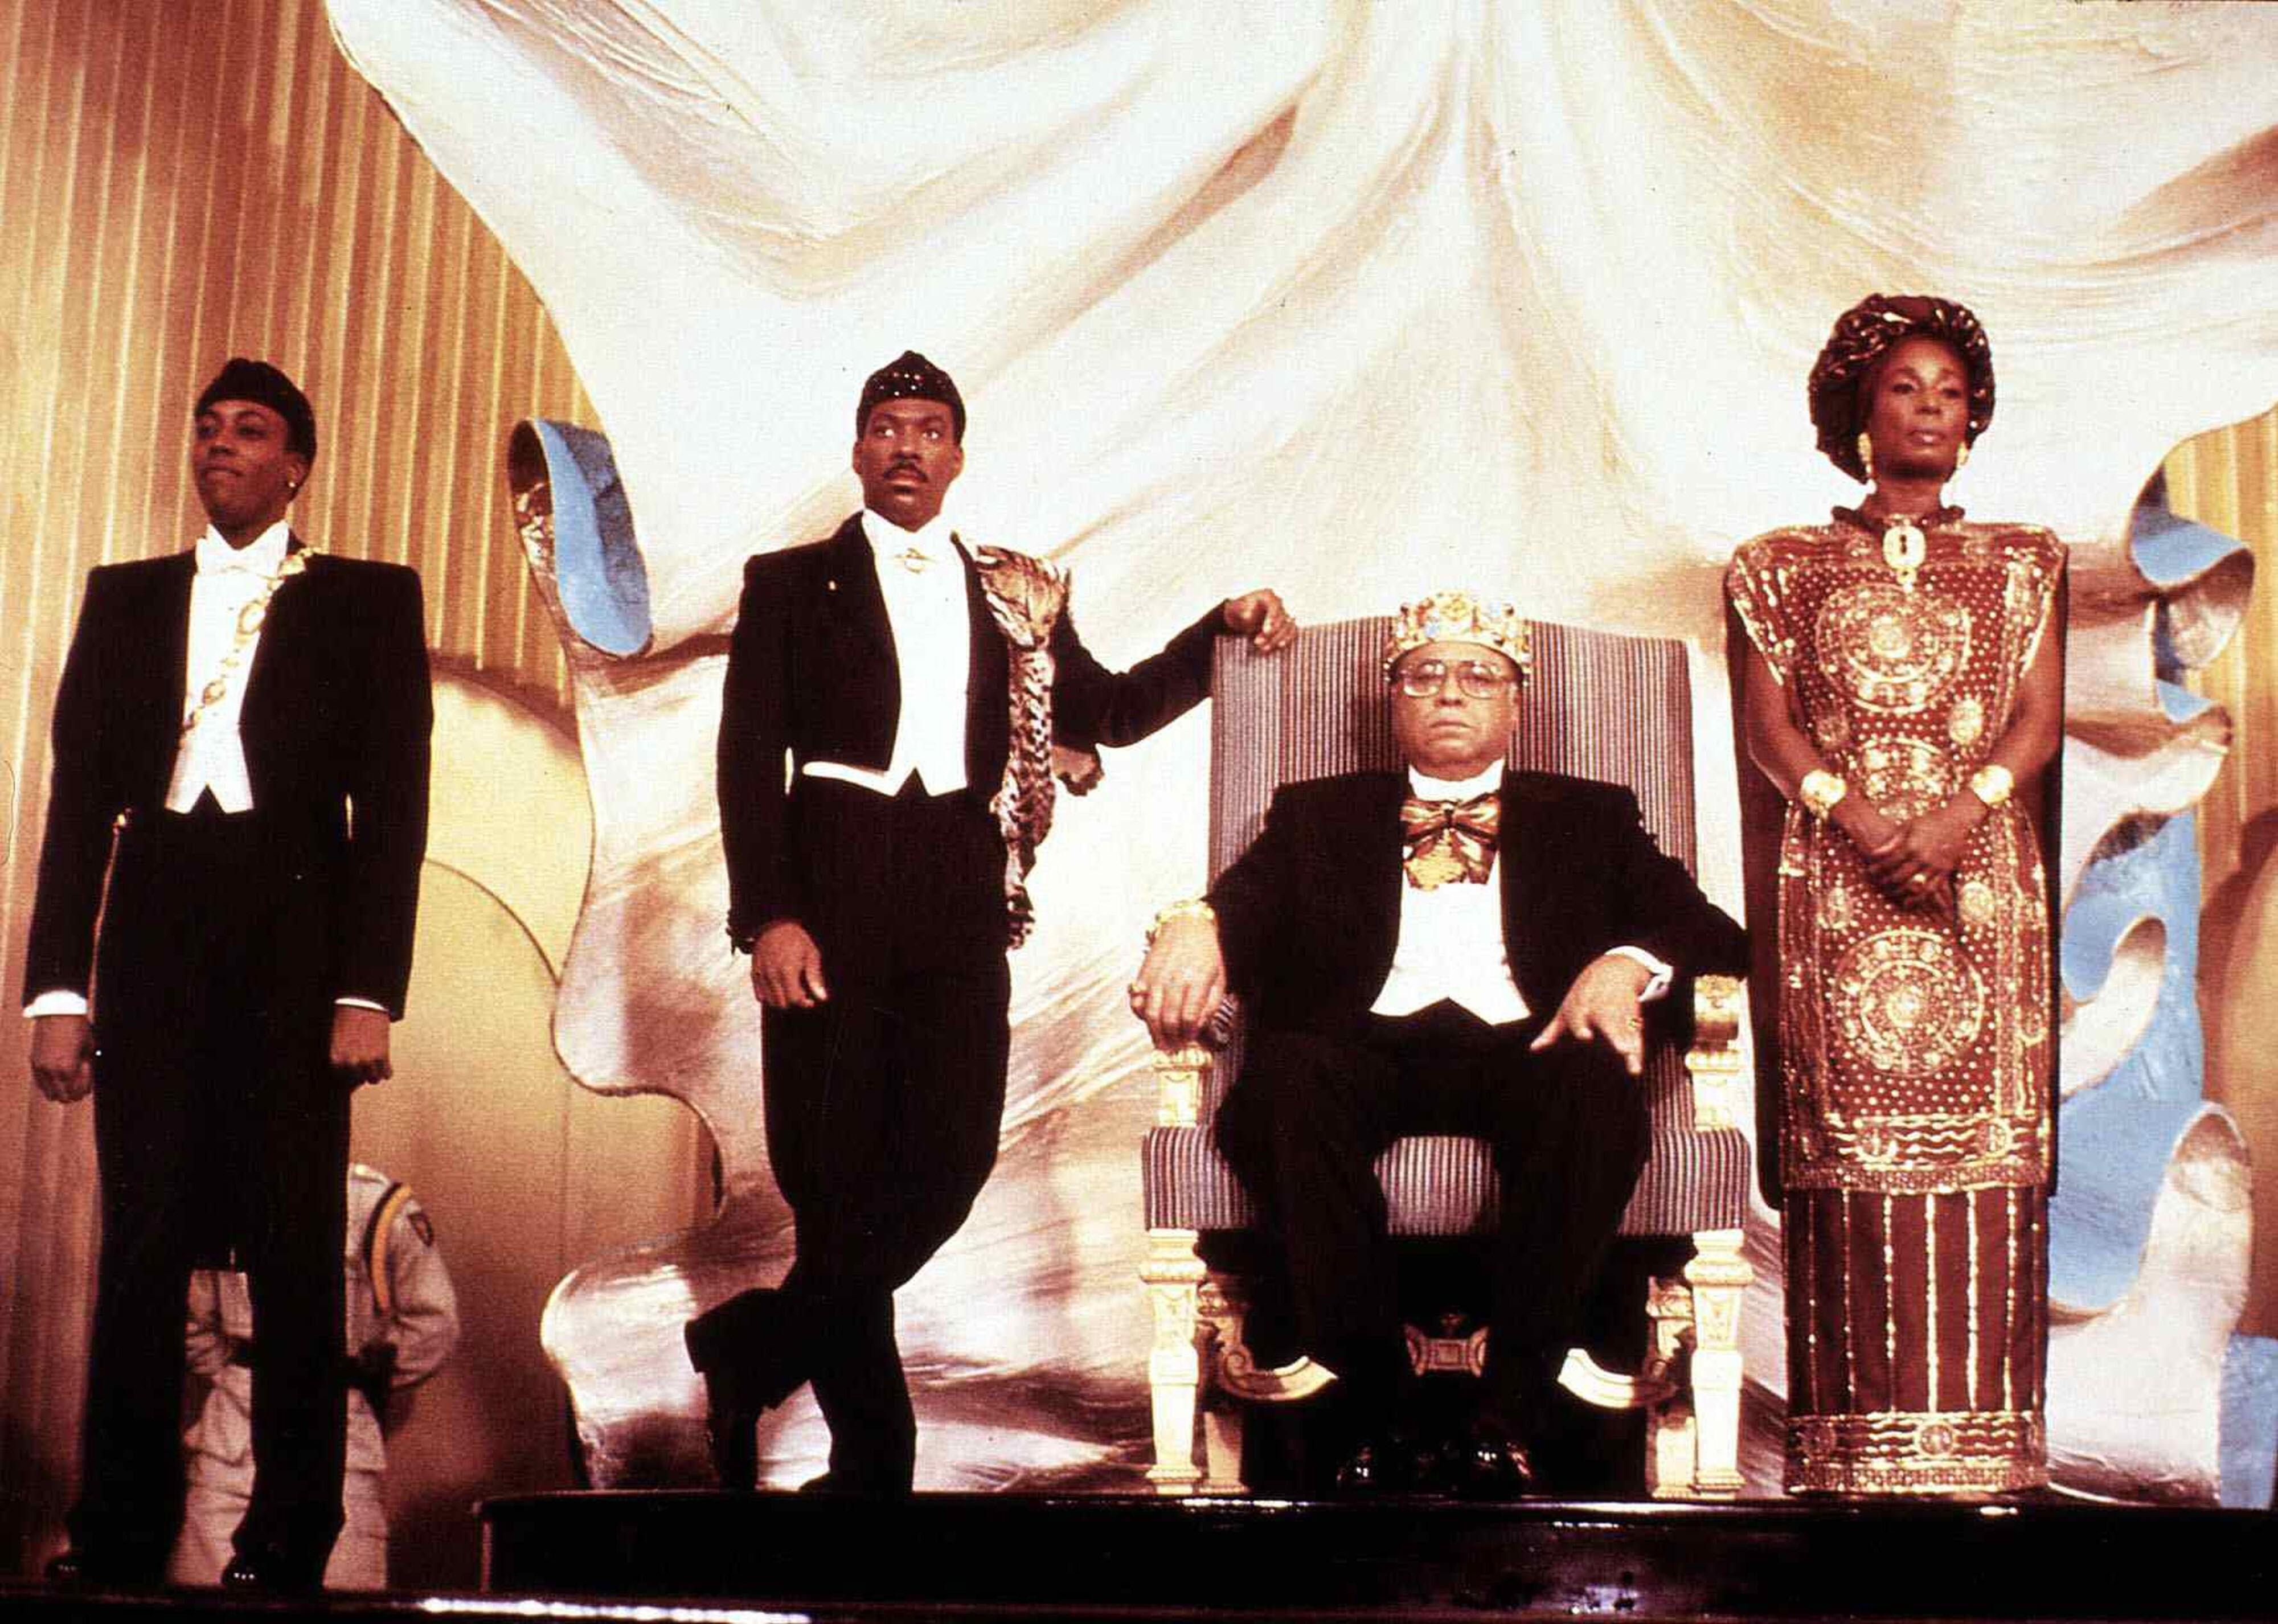 Der Prinz Aus Zamunda  Coming To America  Arsenio Hall, Eddie Murphy, James Earl Jones ,? Koenig Jaffe Joffer (James Earl